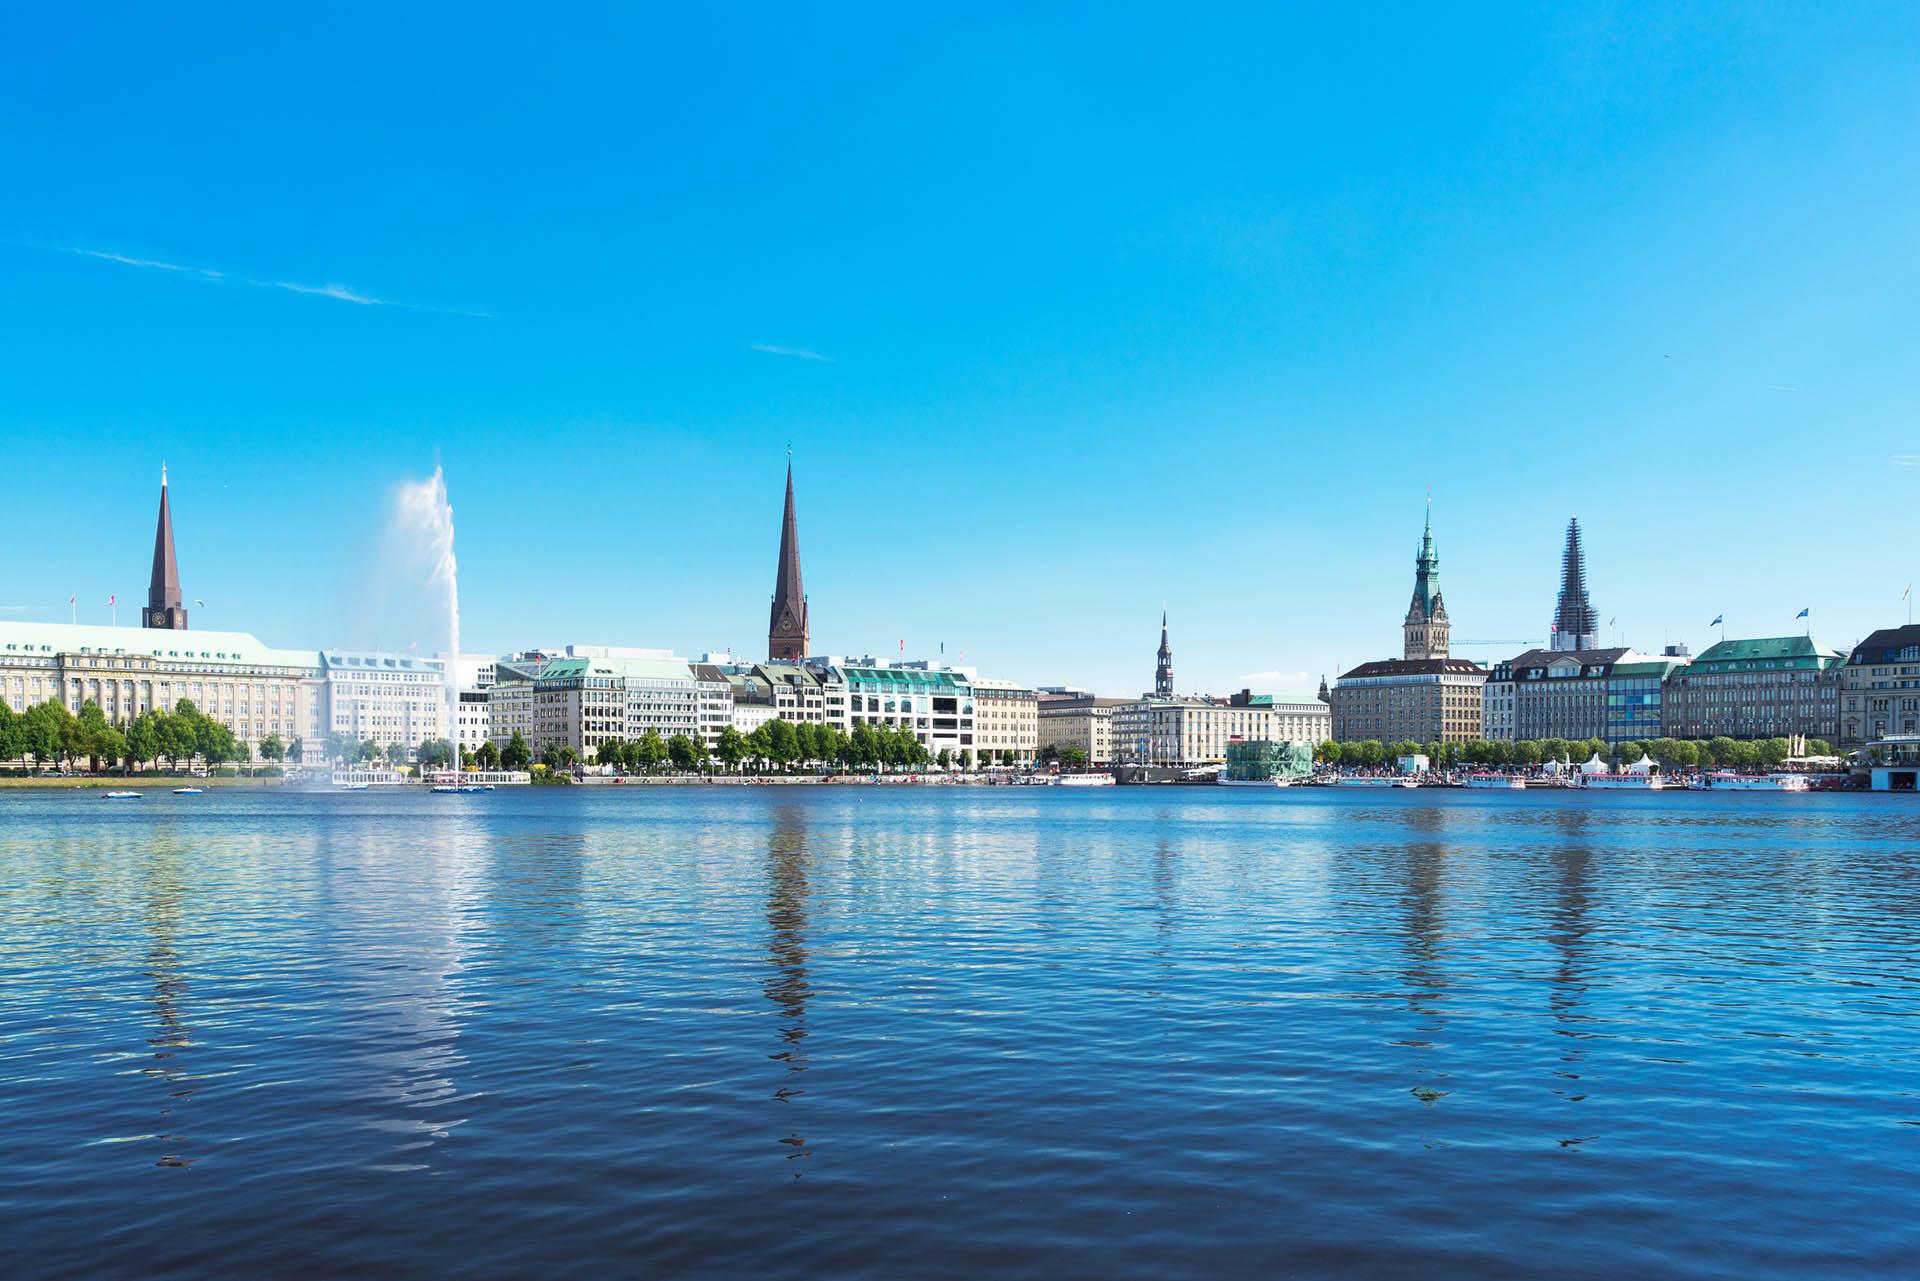 Menzell-Reisebuero-Hamburg-Innenstadt-Urlaubsreisen-Geschaeftsreisen-Alster